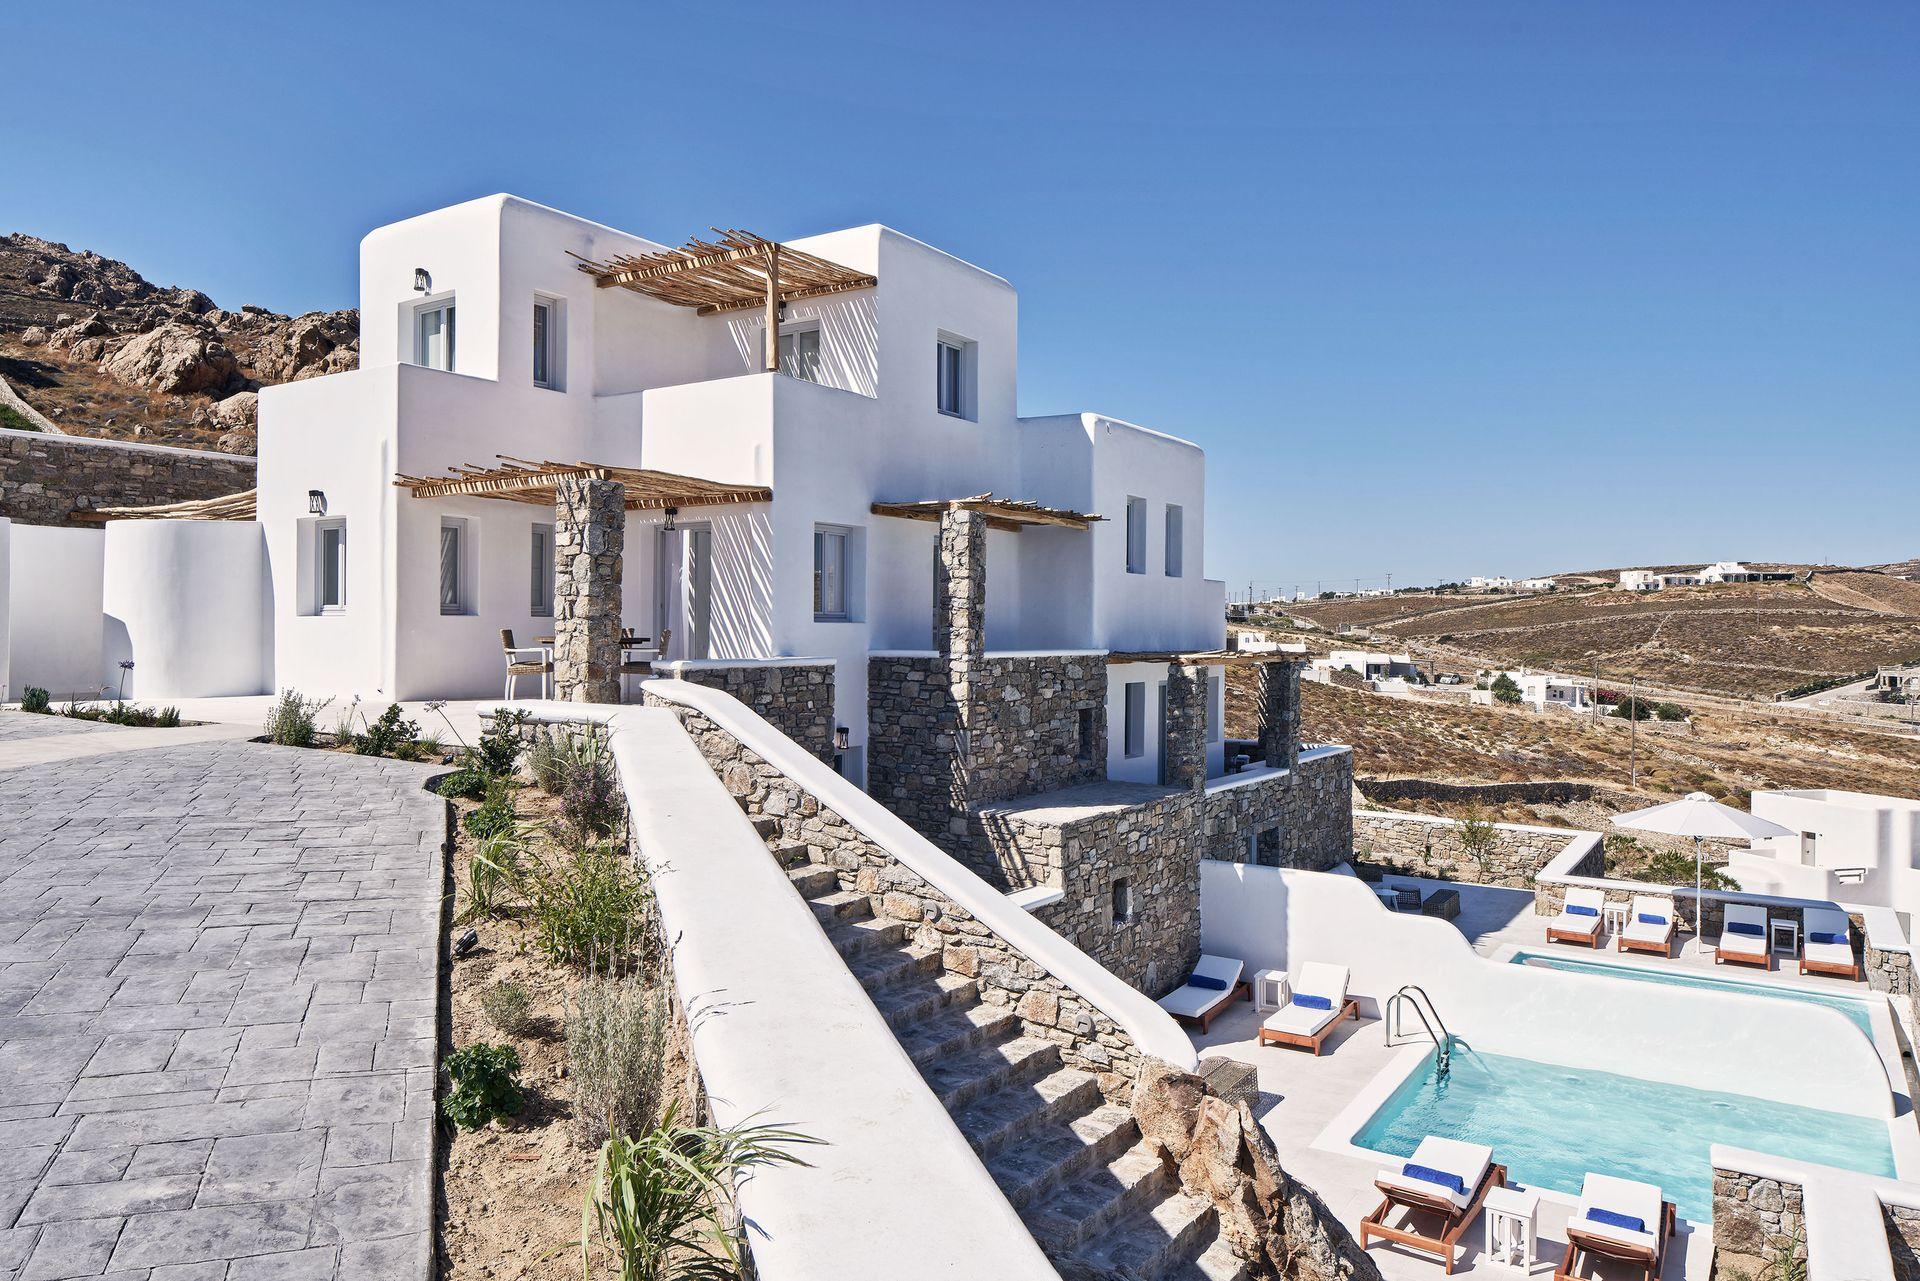 Katikies Villas Mykonos - Μύκονος ✦ 2 Ημέρες (1 Διανυκτέρευση) ✦ έως 3 άτομα ✦ Πρωινό ✦ 27/08/2020 έως 26/09/2020 ✦ Free Wi-Fi!